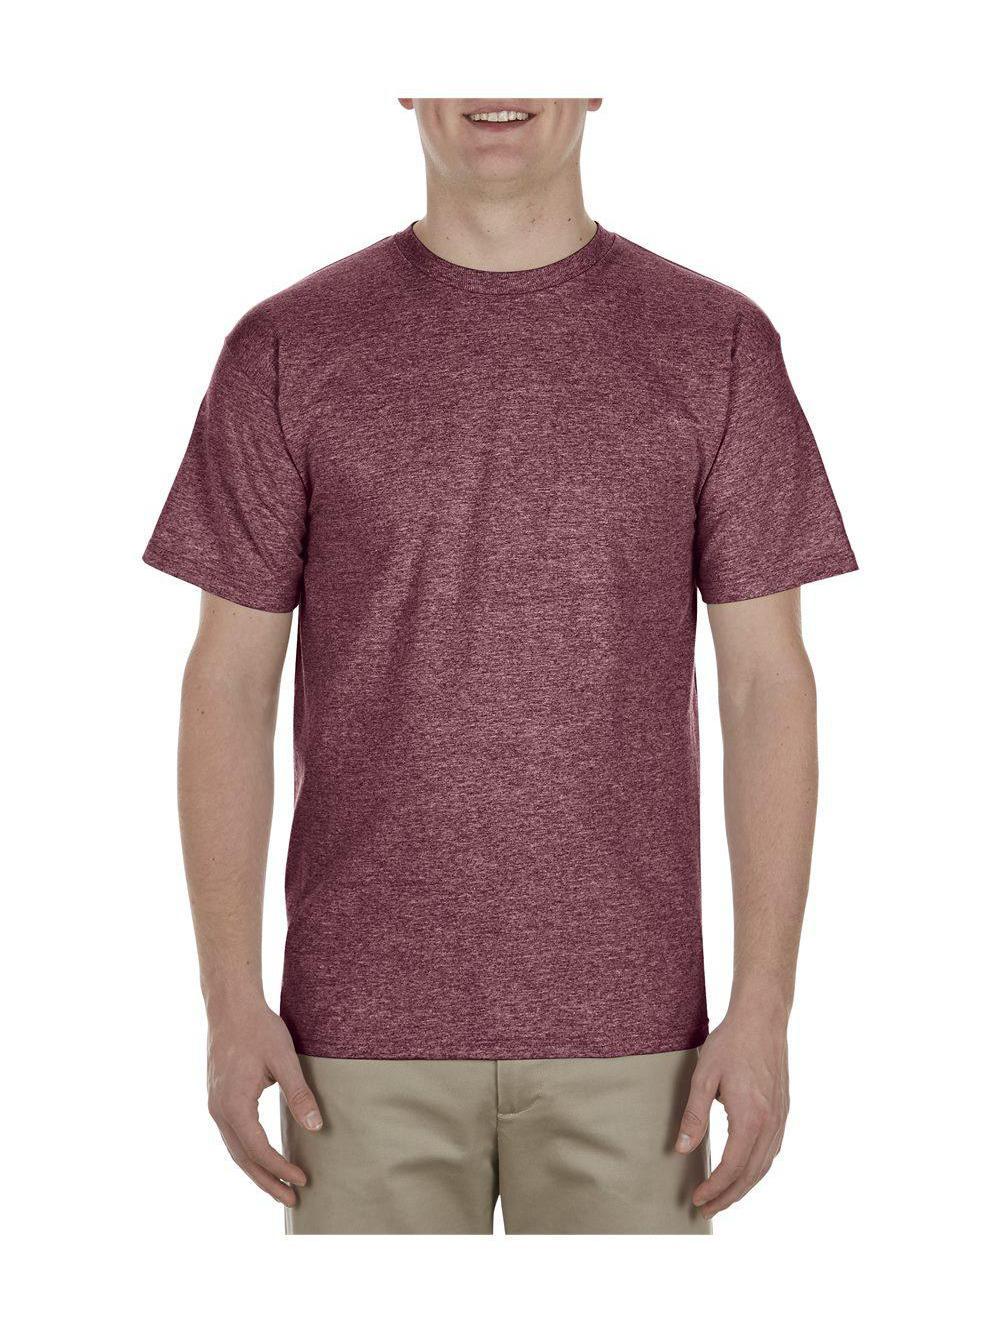 ALSTYLE-Premium-T-Shirt-1701 thumbnail 15